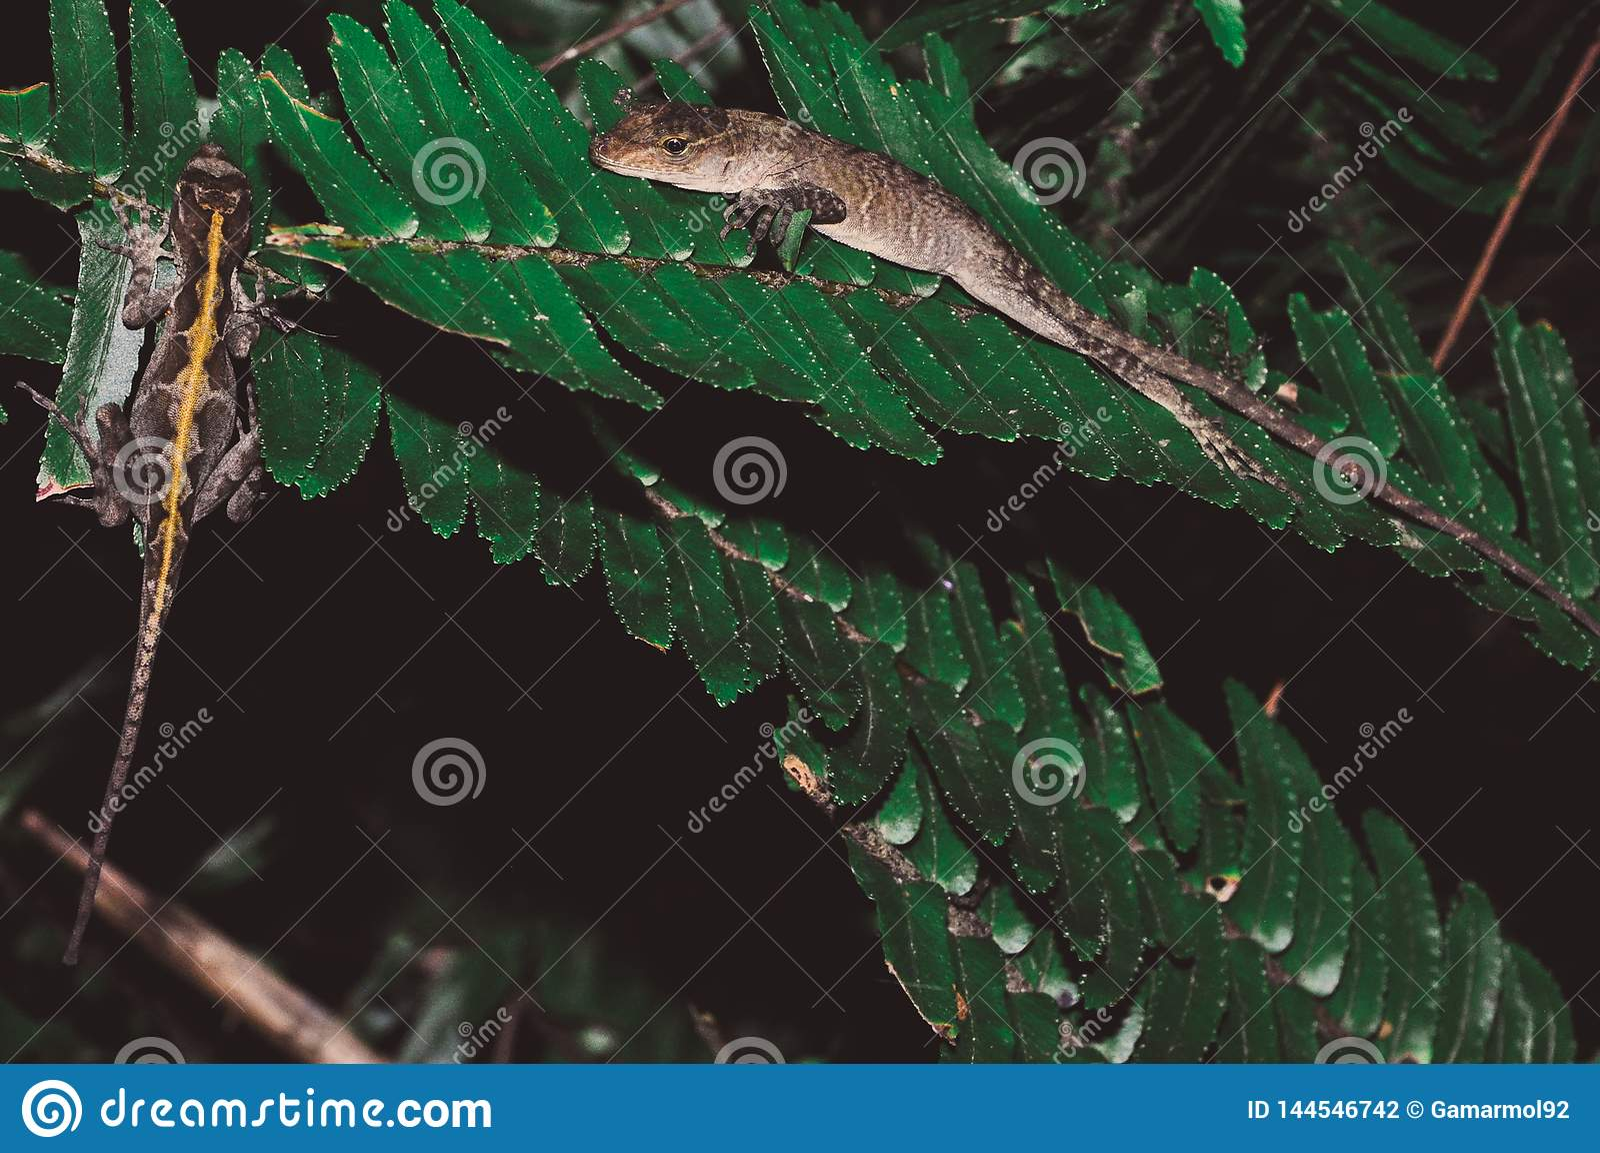 Lizard couple on leaves